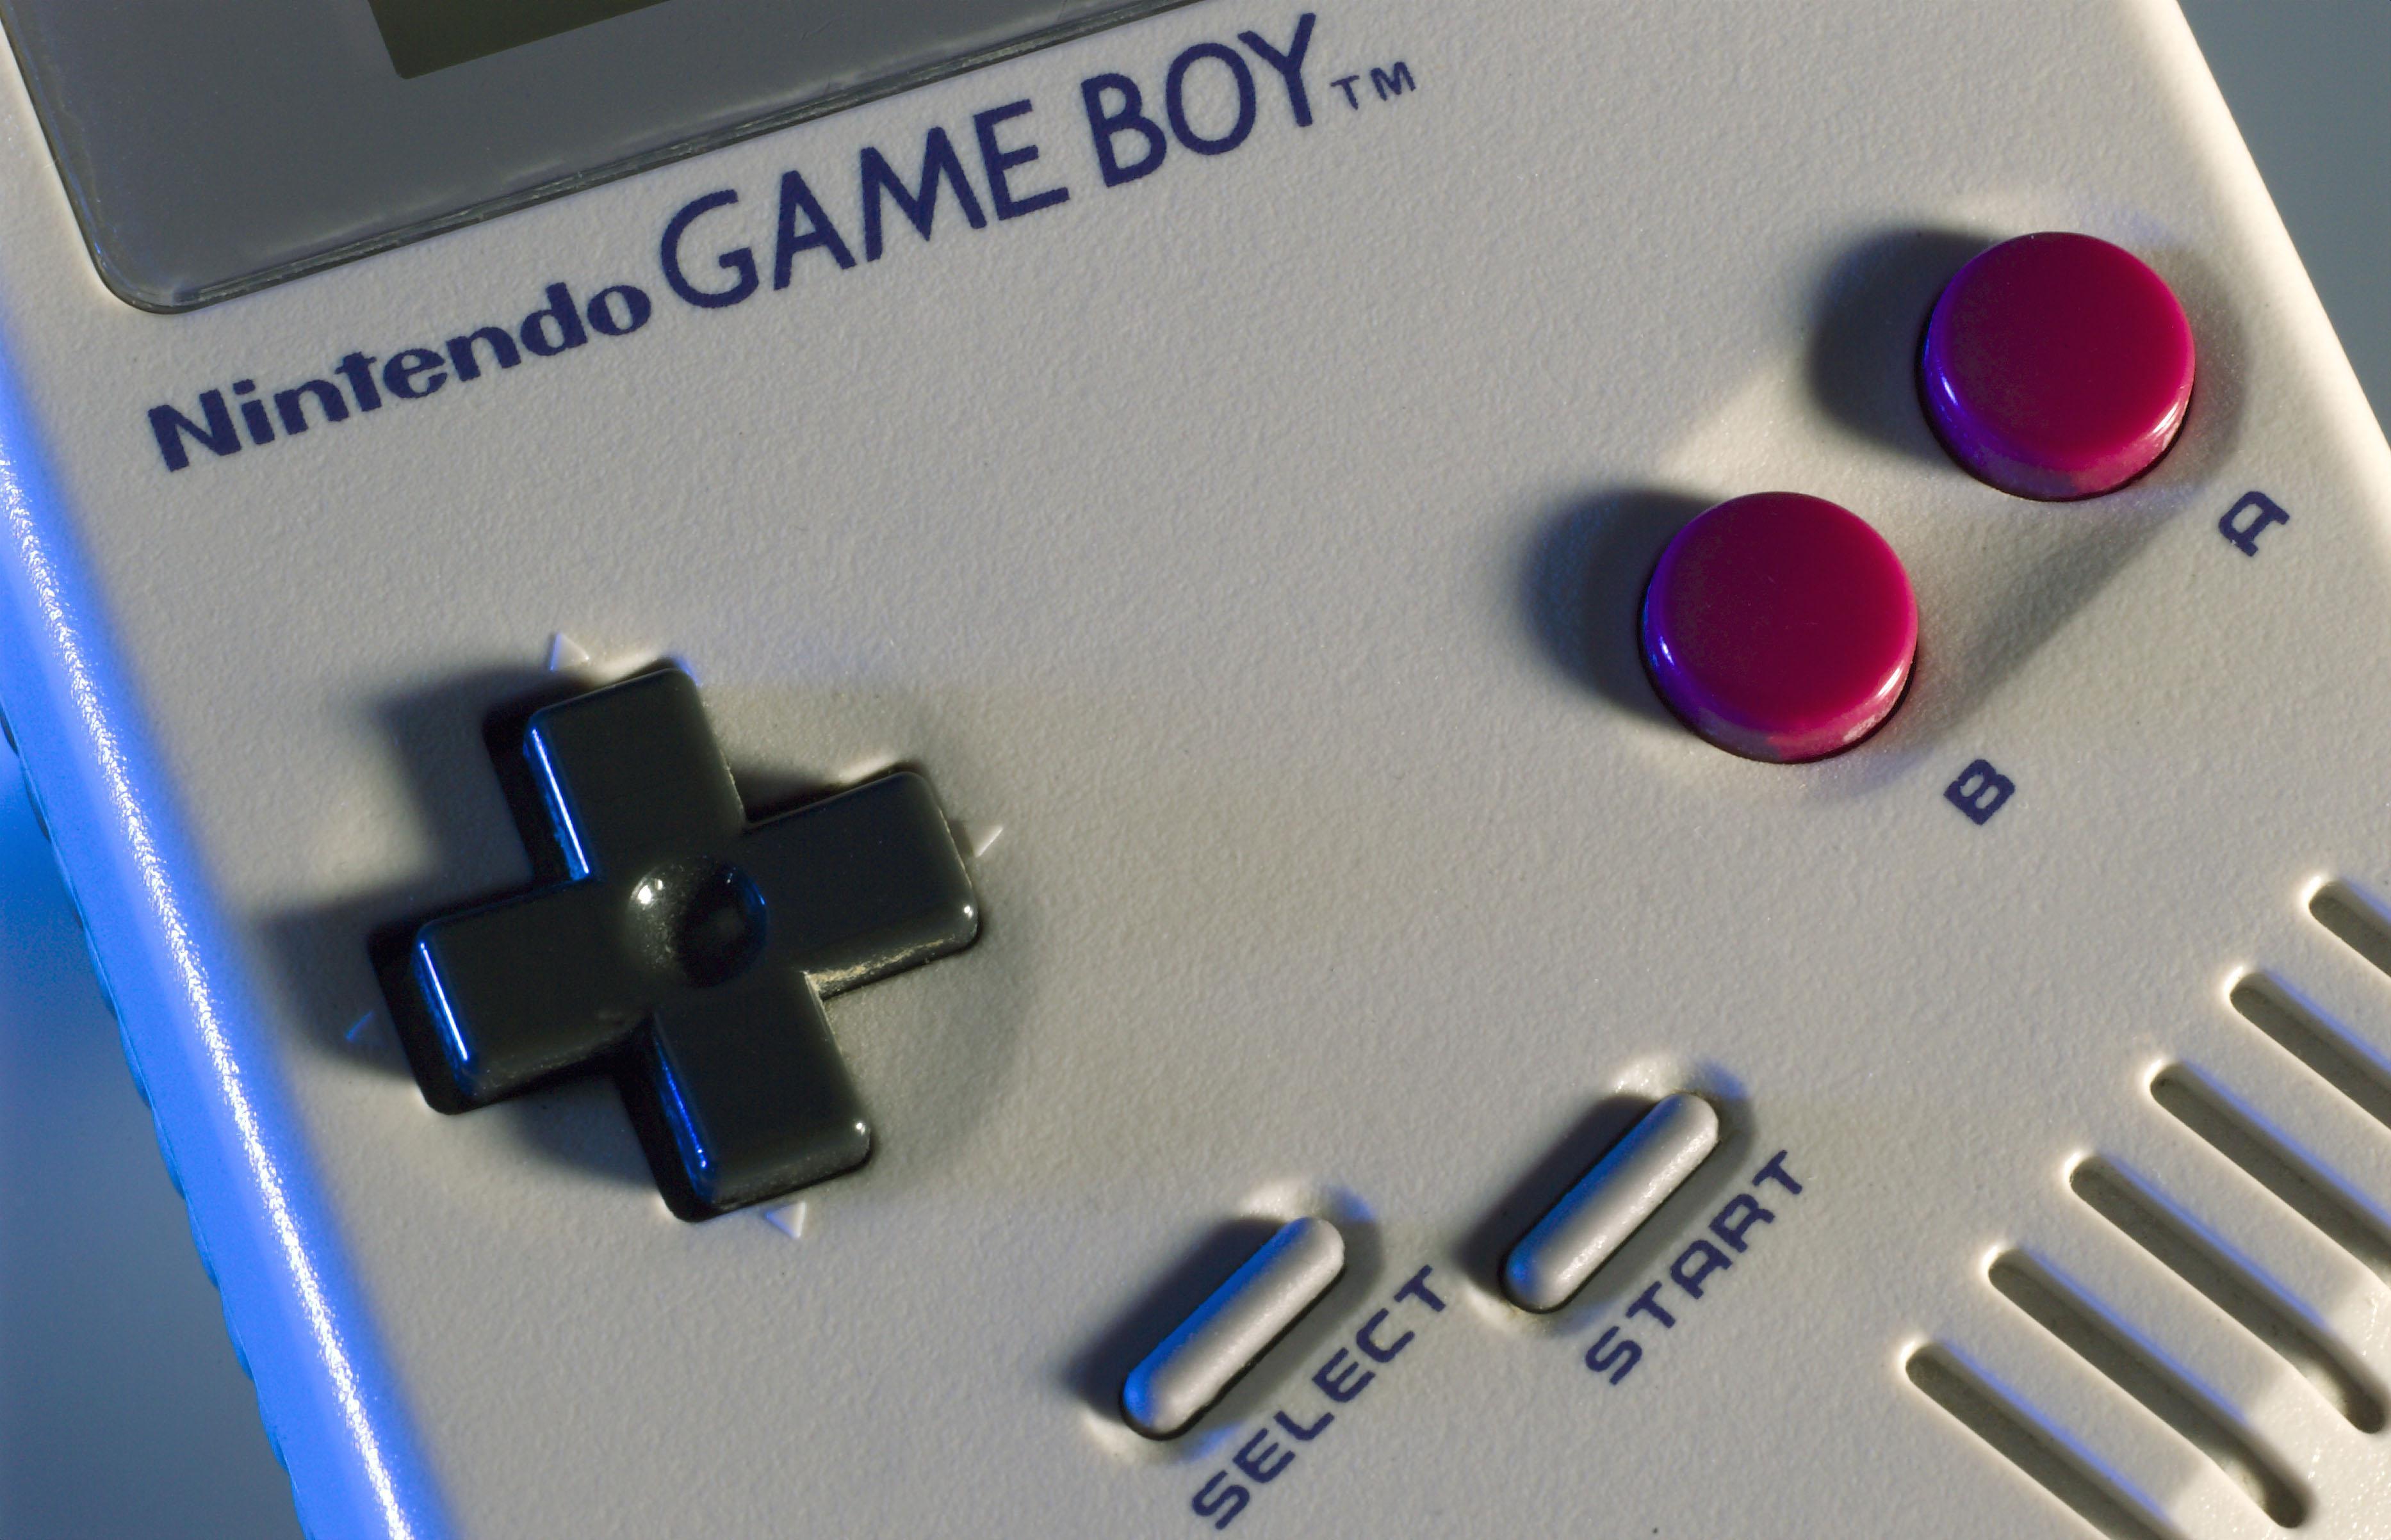 Nintendo Game Boy, 1989.